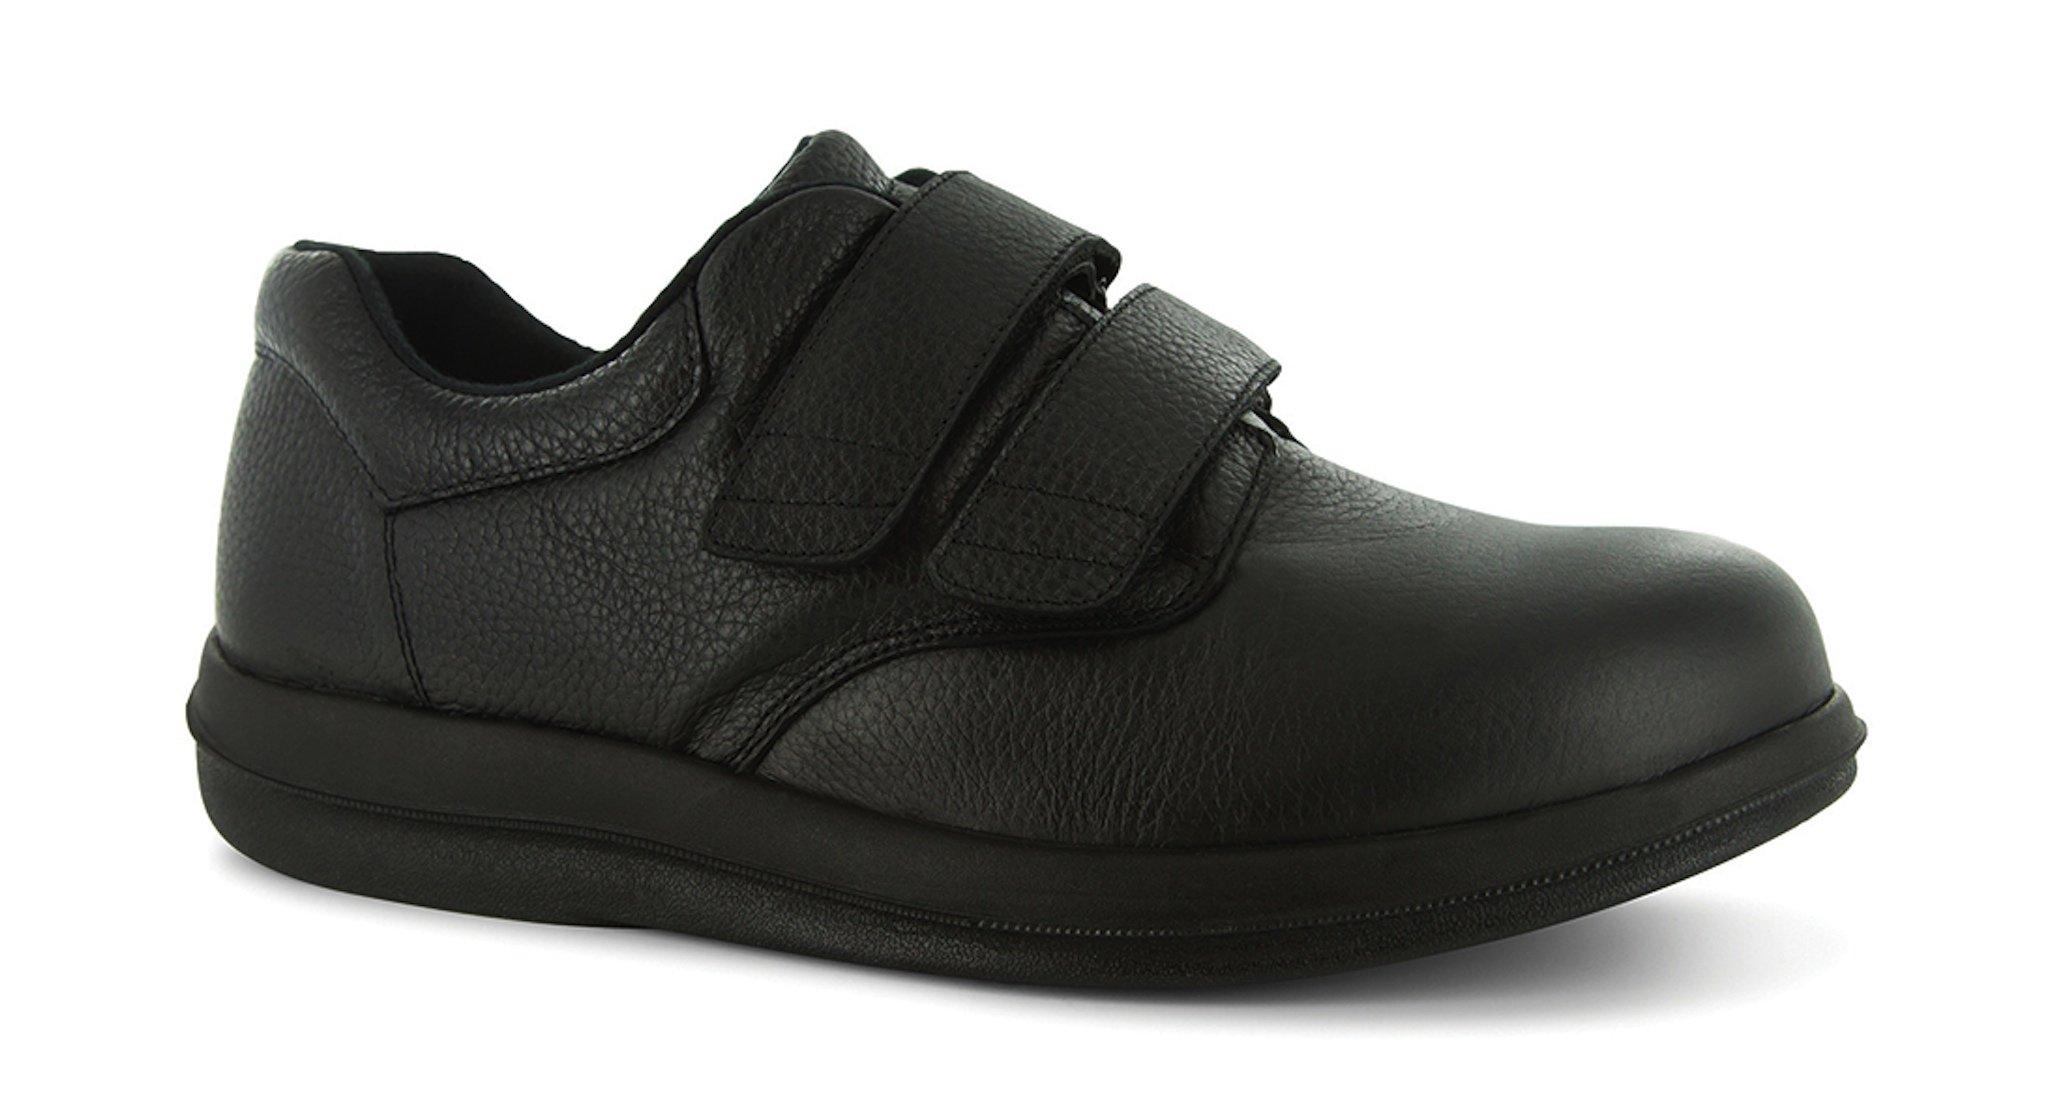 P W Minor Leisure Time Men's Therapeutic Extra Depth Shoe: Black 14 XX-Wide (5E) Velcro